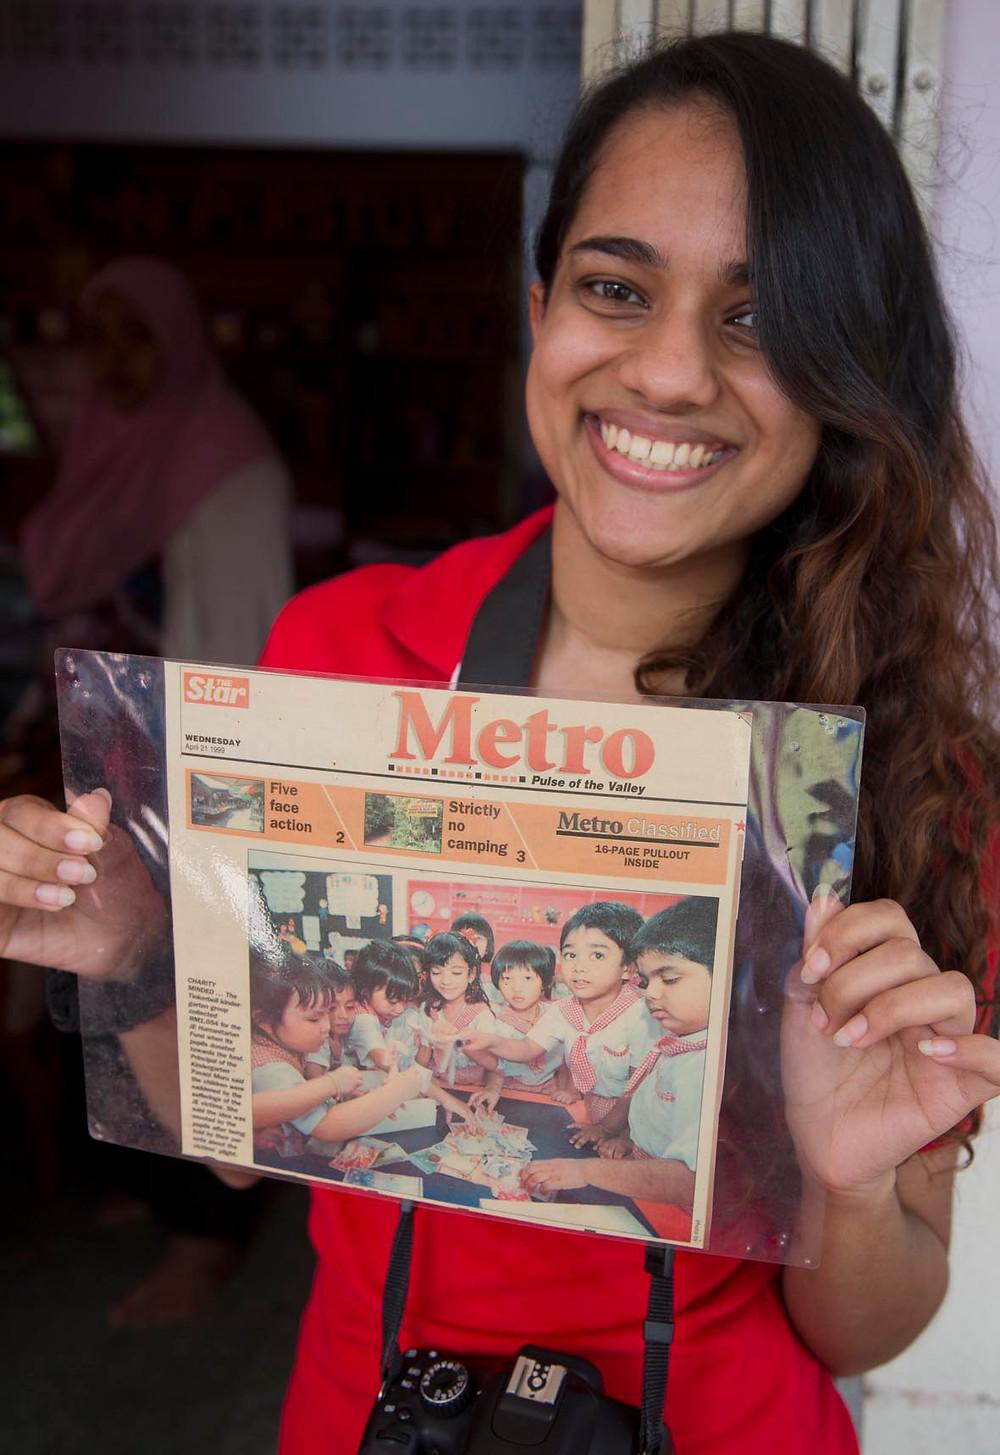 serembanonline picture of Naveena's sister Ms. Ashveena by photographer Nic Falconer nicaliss